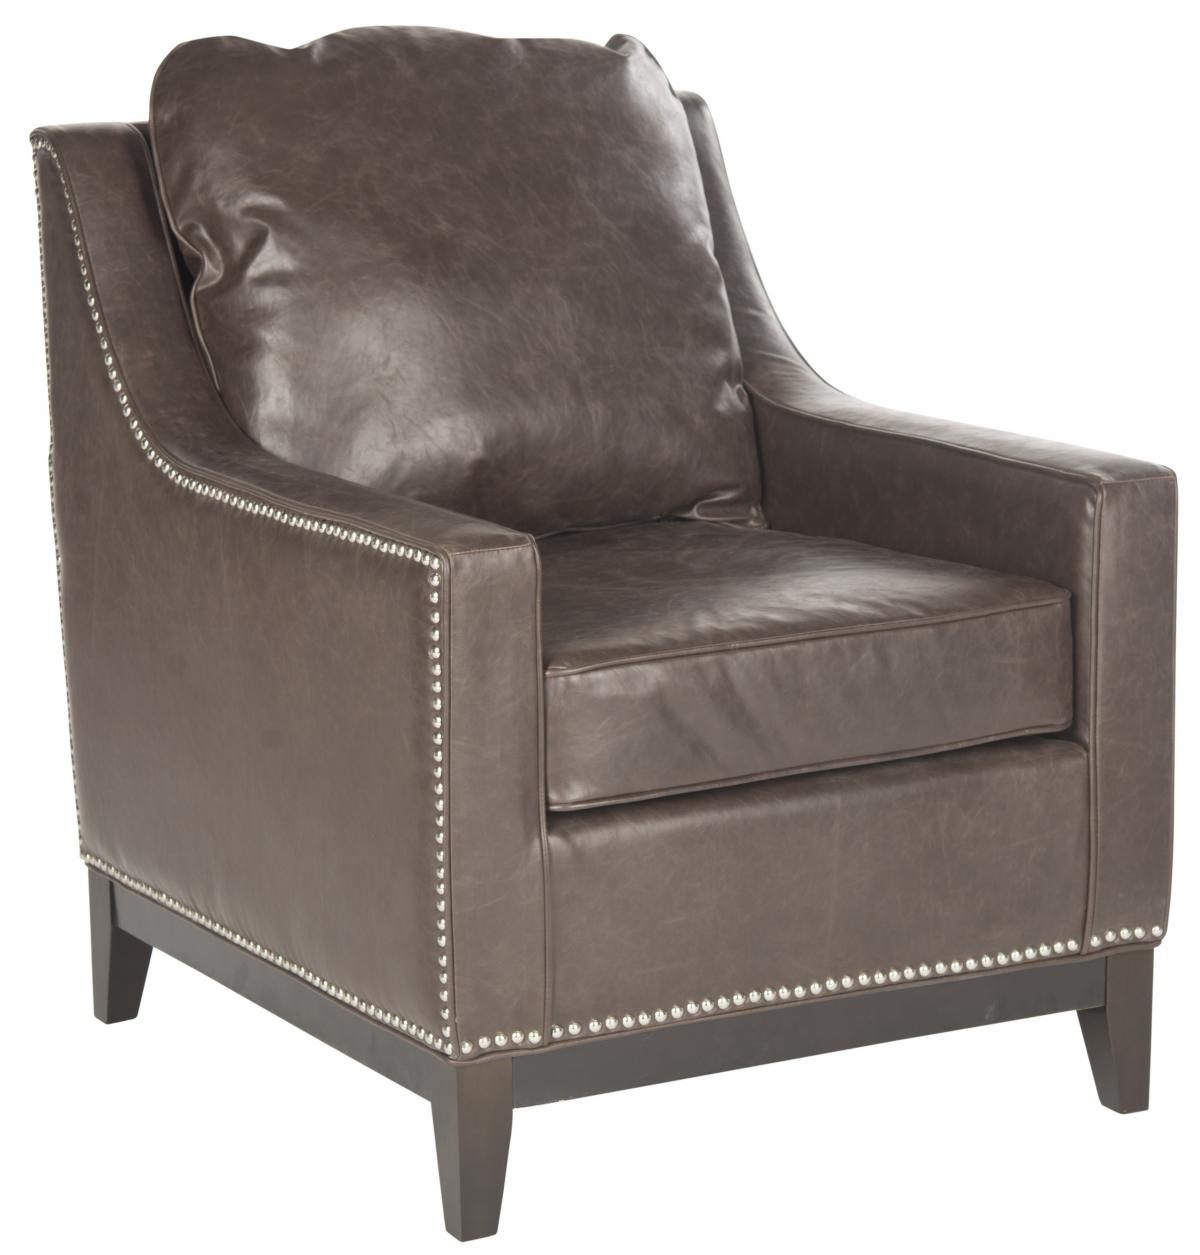 antique accent chair kids wood adirondack safavieh mcr4570c colton club brown 862